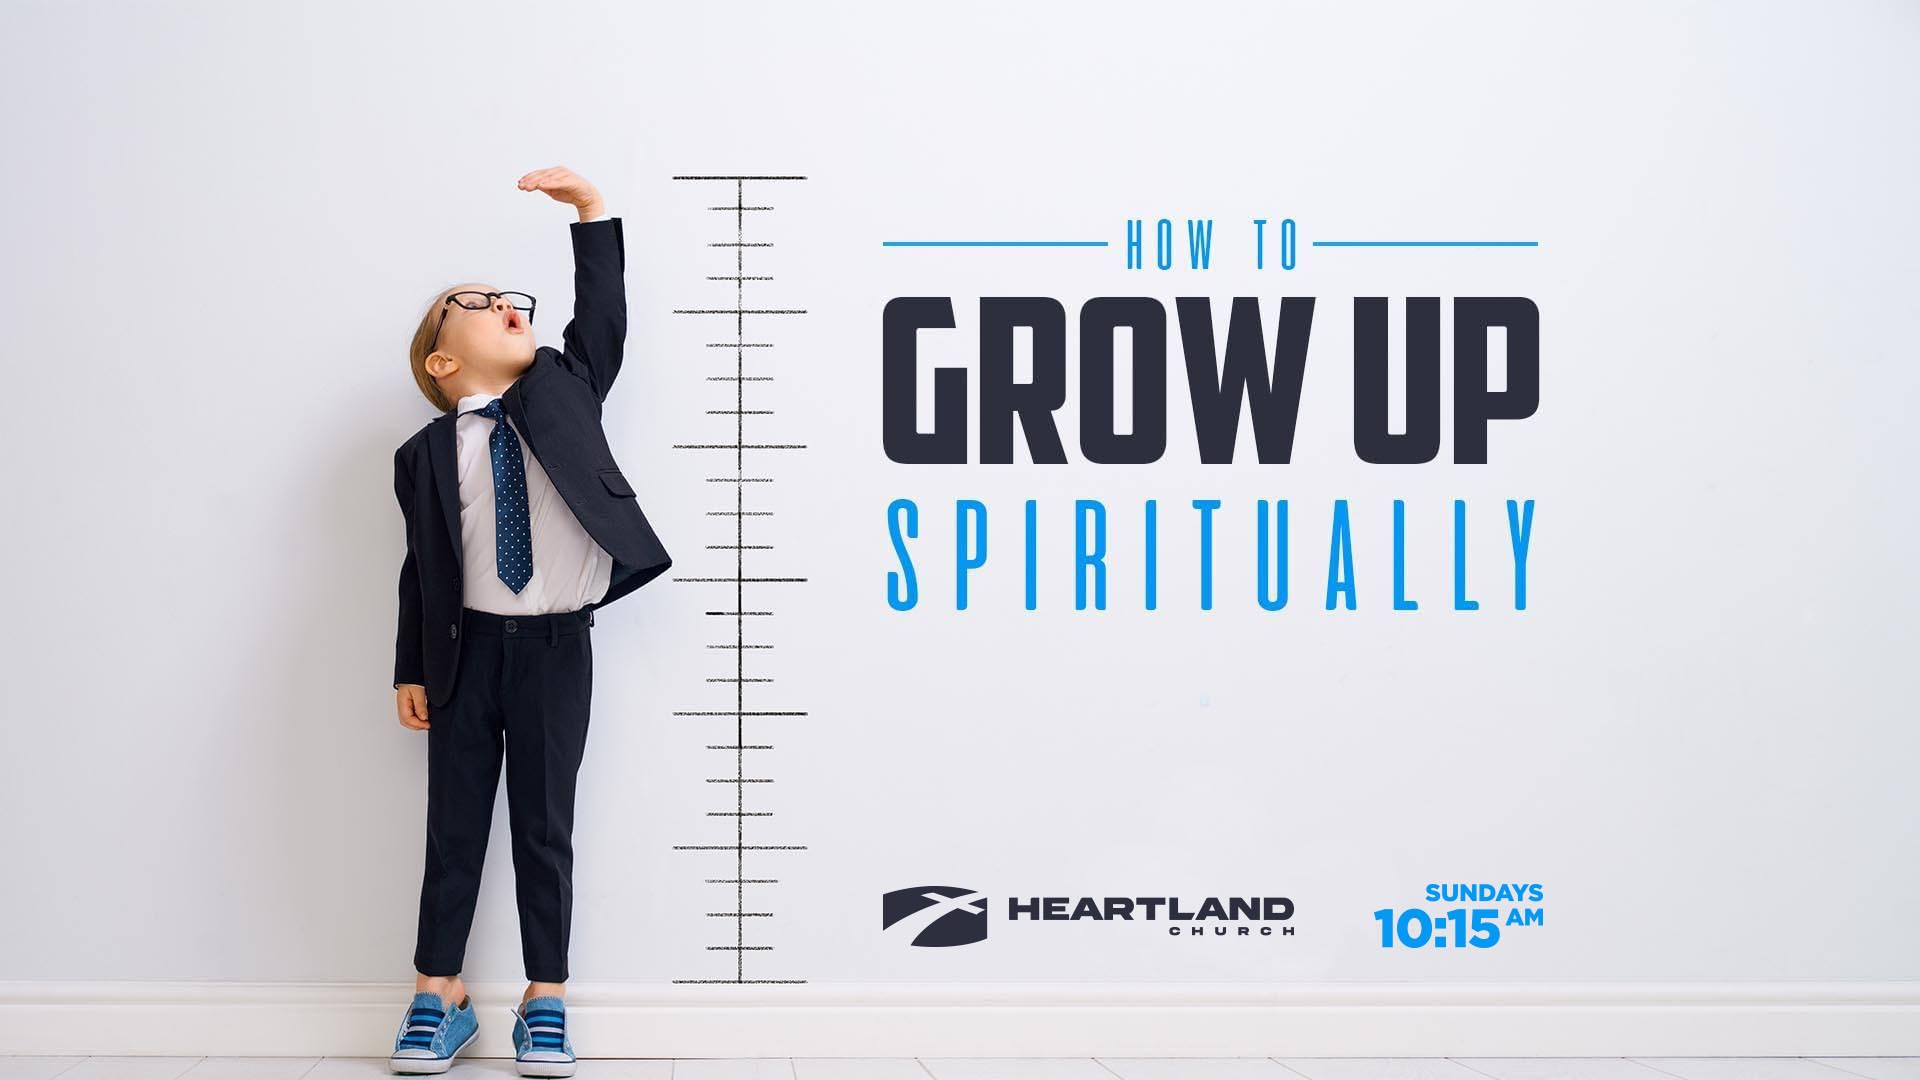 How To Grow Up Spiritually Artwork SUNDAYS